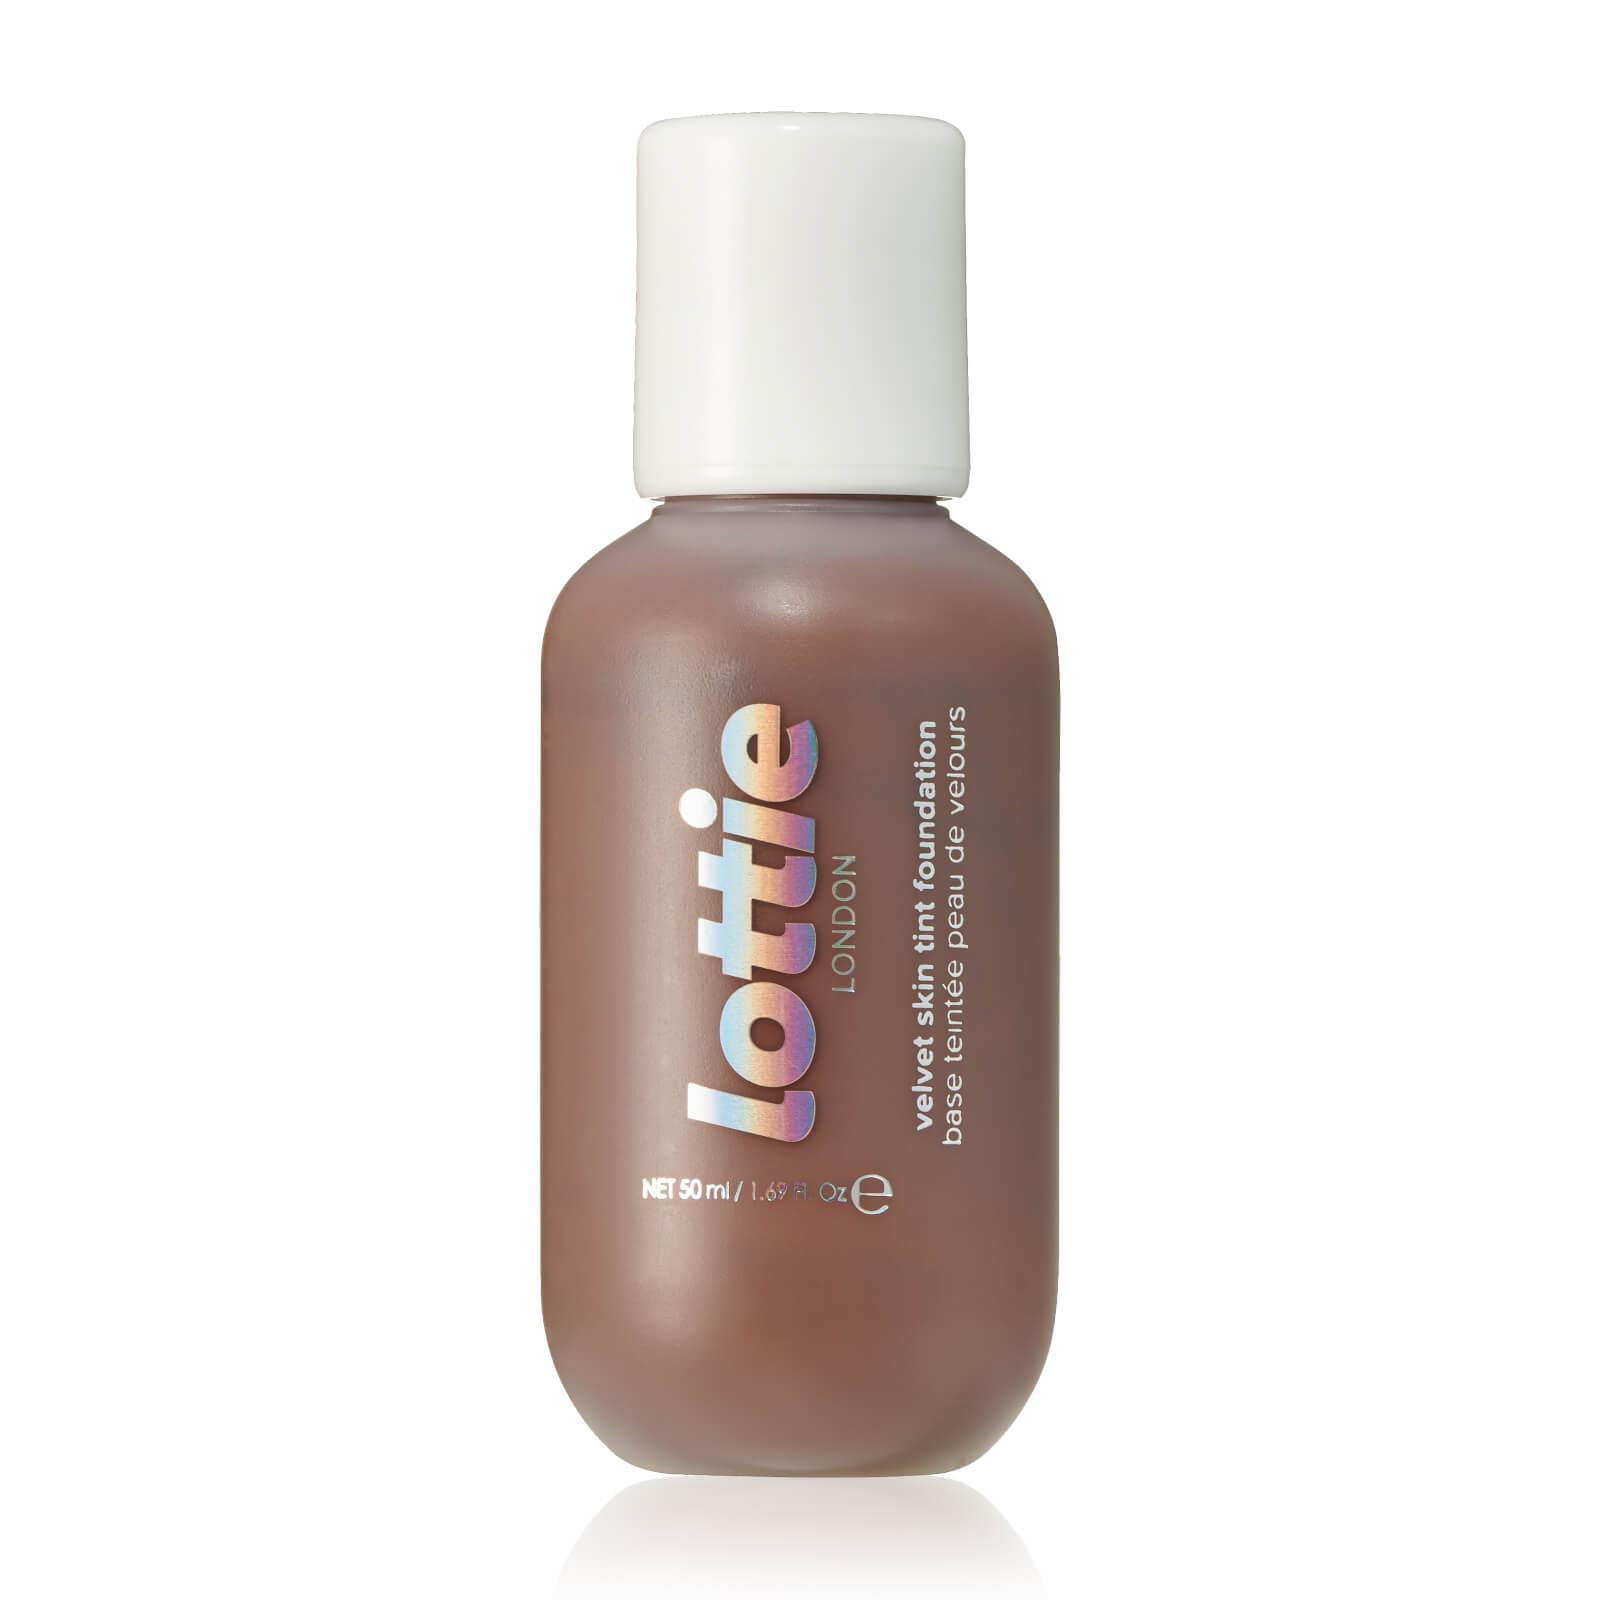 Купить Lottie London Velvet Skin Tint (Various Shades) - Deep Y040